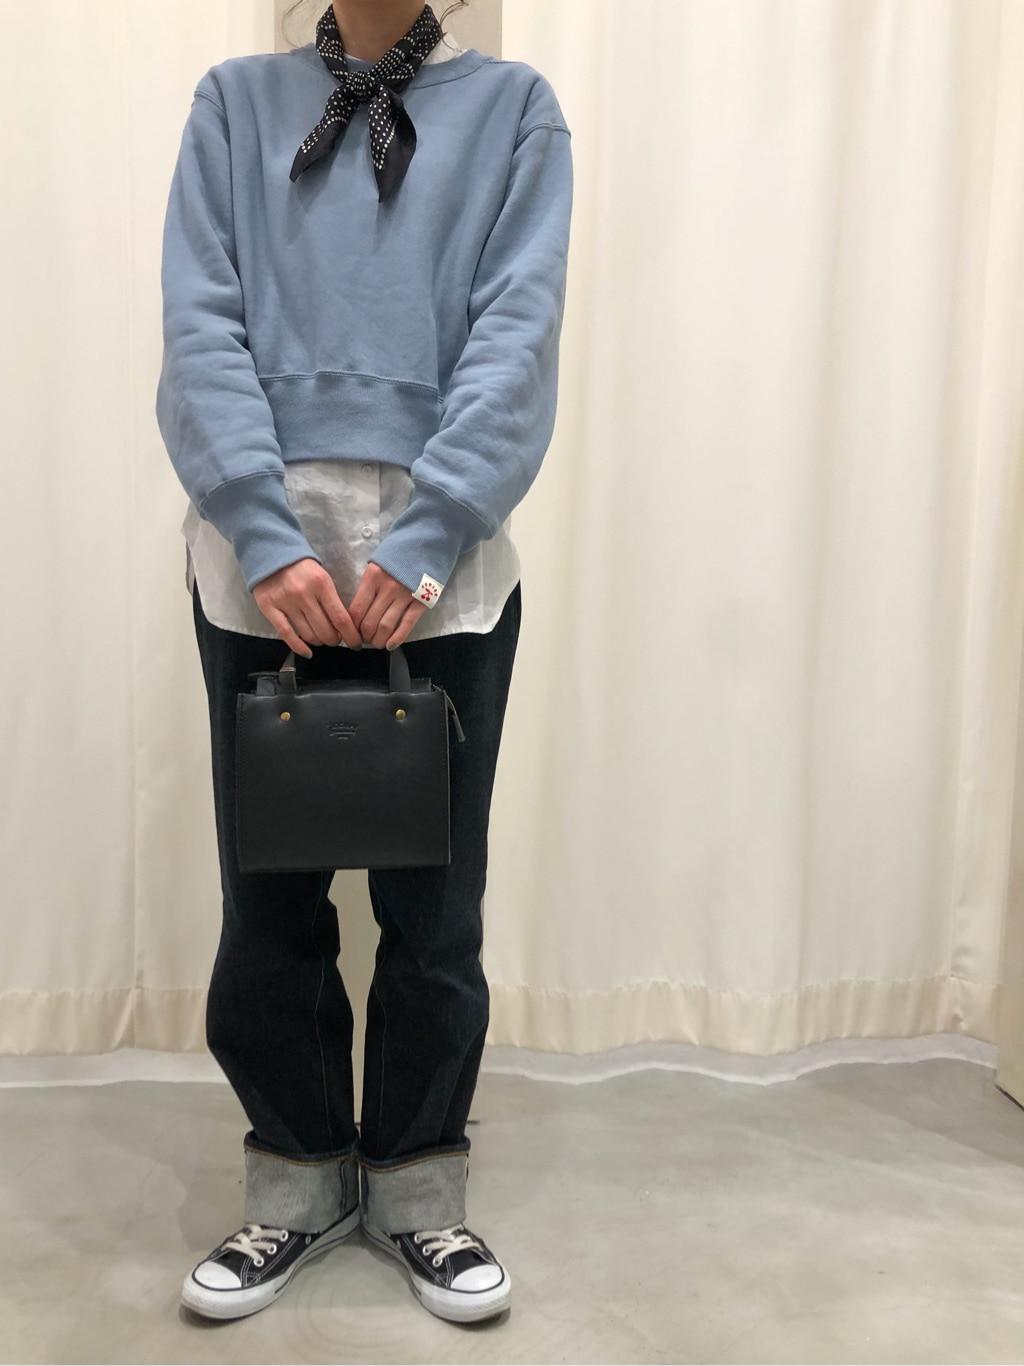 - CHILD WOMAN CHILD WOMAN , PAR ICI 東京スカイツリータウン・ソラマチ 身長:160cm 2021.01.15